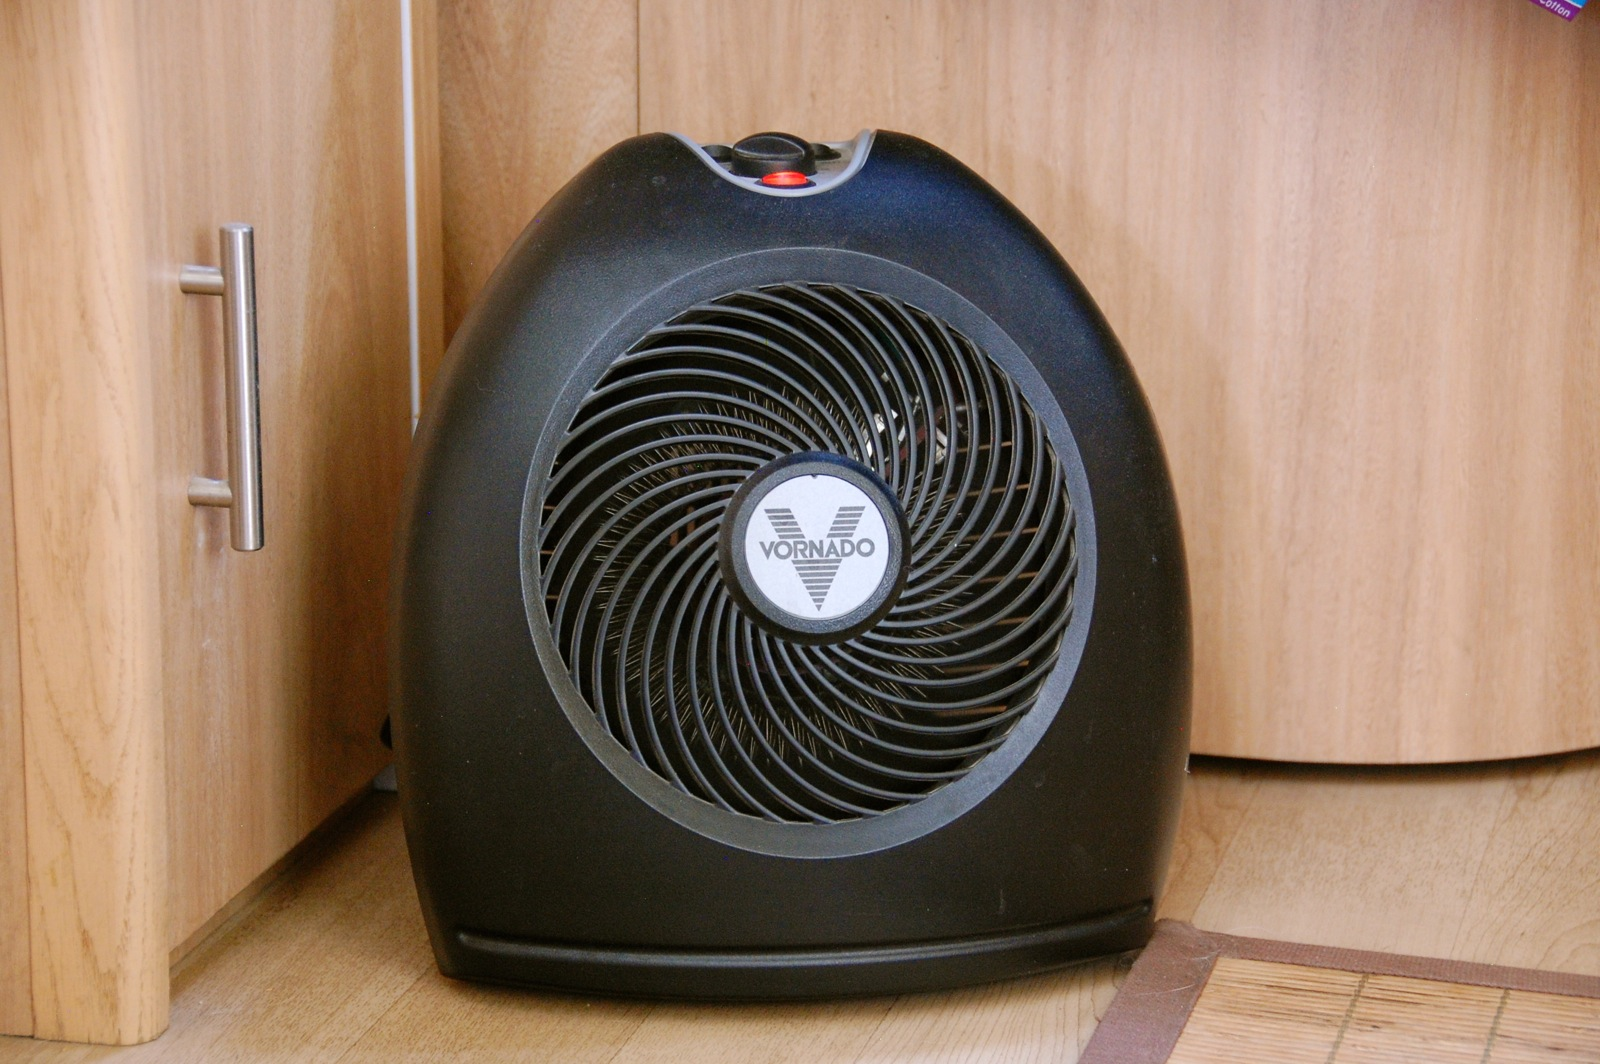 Click image for larger version  Name:DSC_0330 Vornado Heater close-up.jpg Views:54 Size:424.8 KB ID:253408